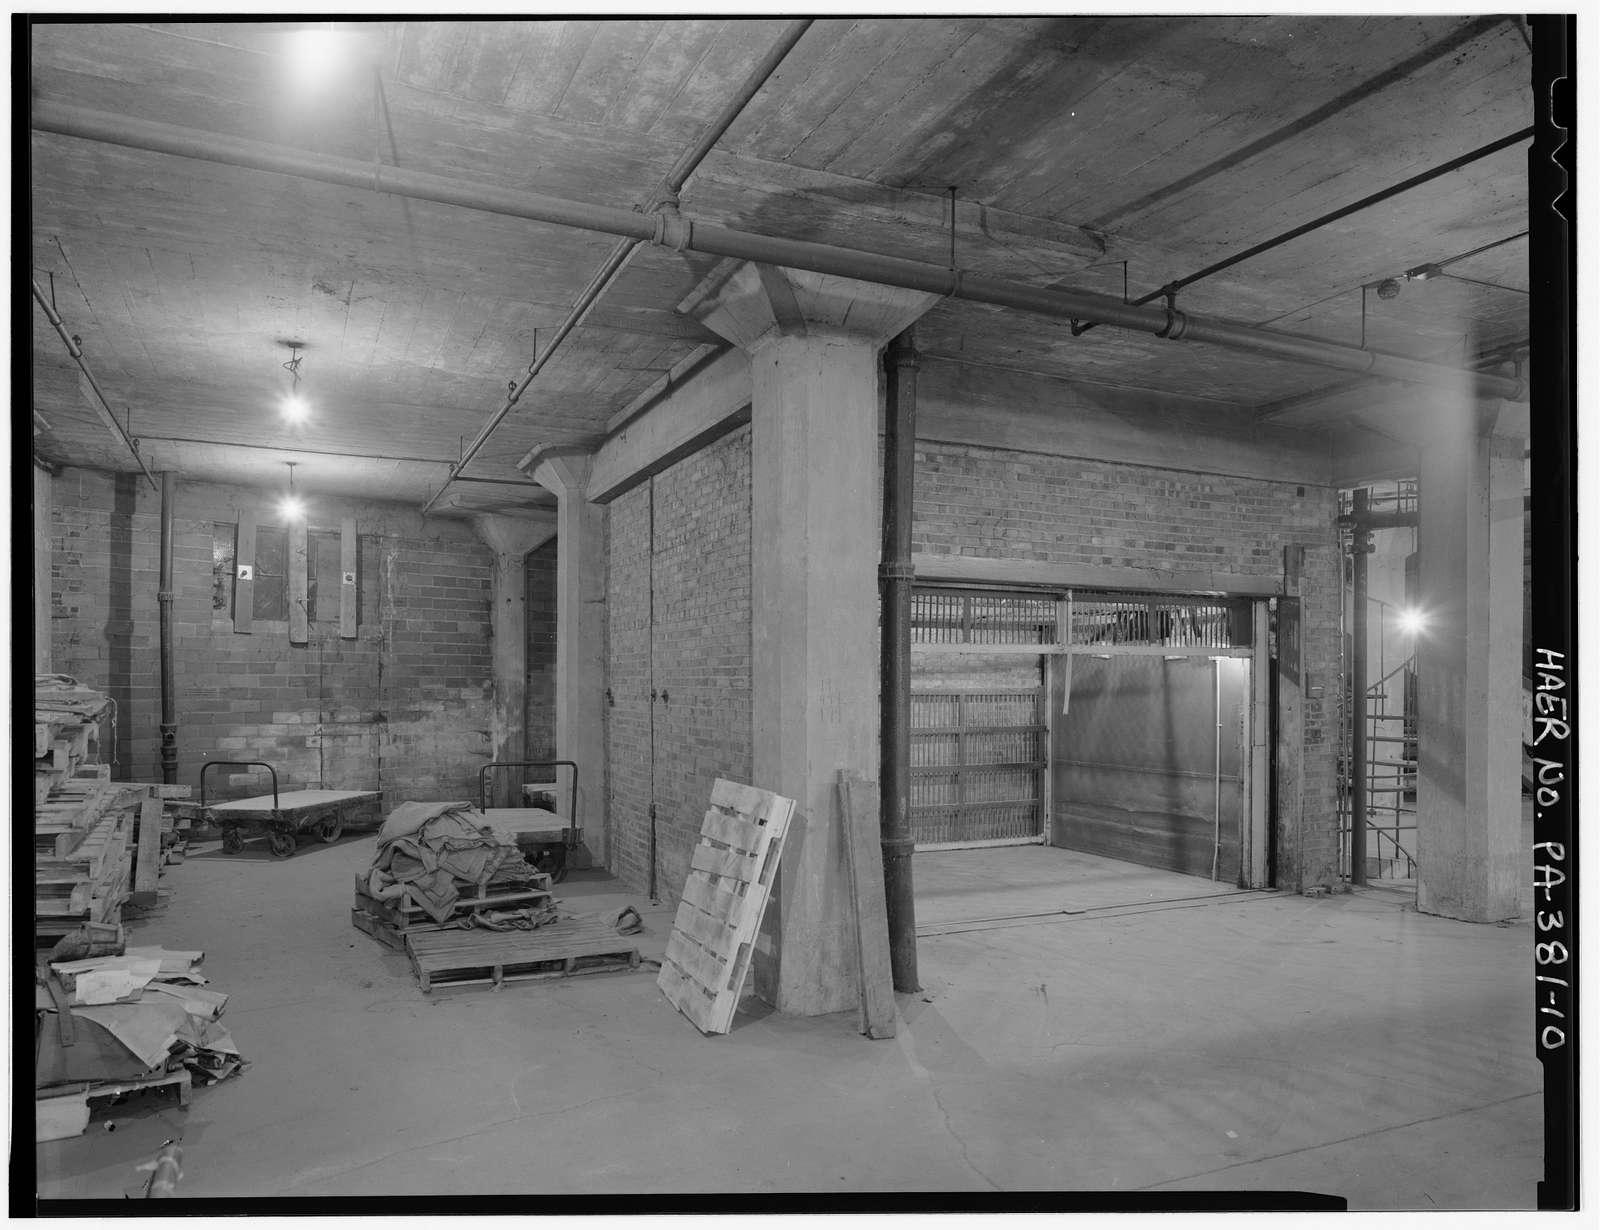 Stewart Company Grain Elevator, 16 West Carson Street, Pittsburgh, Allegheny County, PA